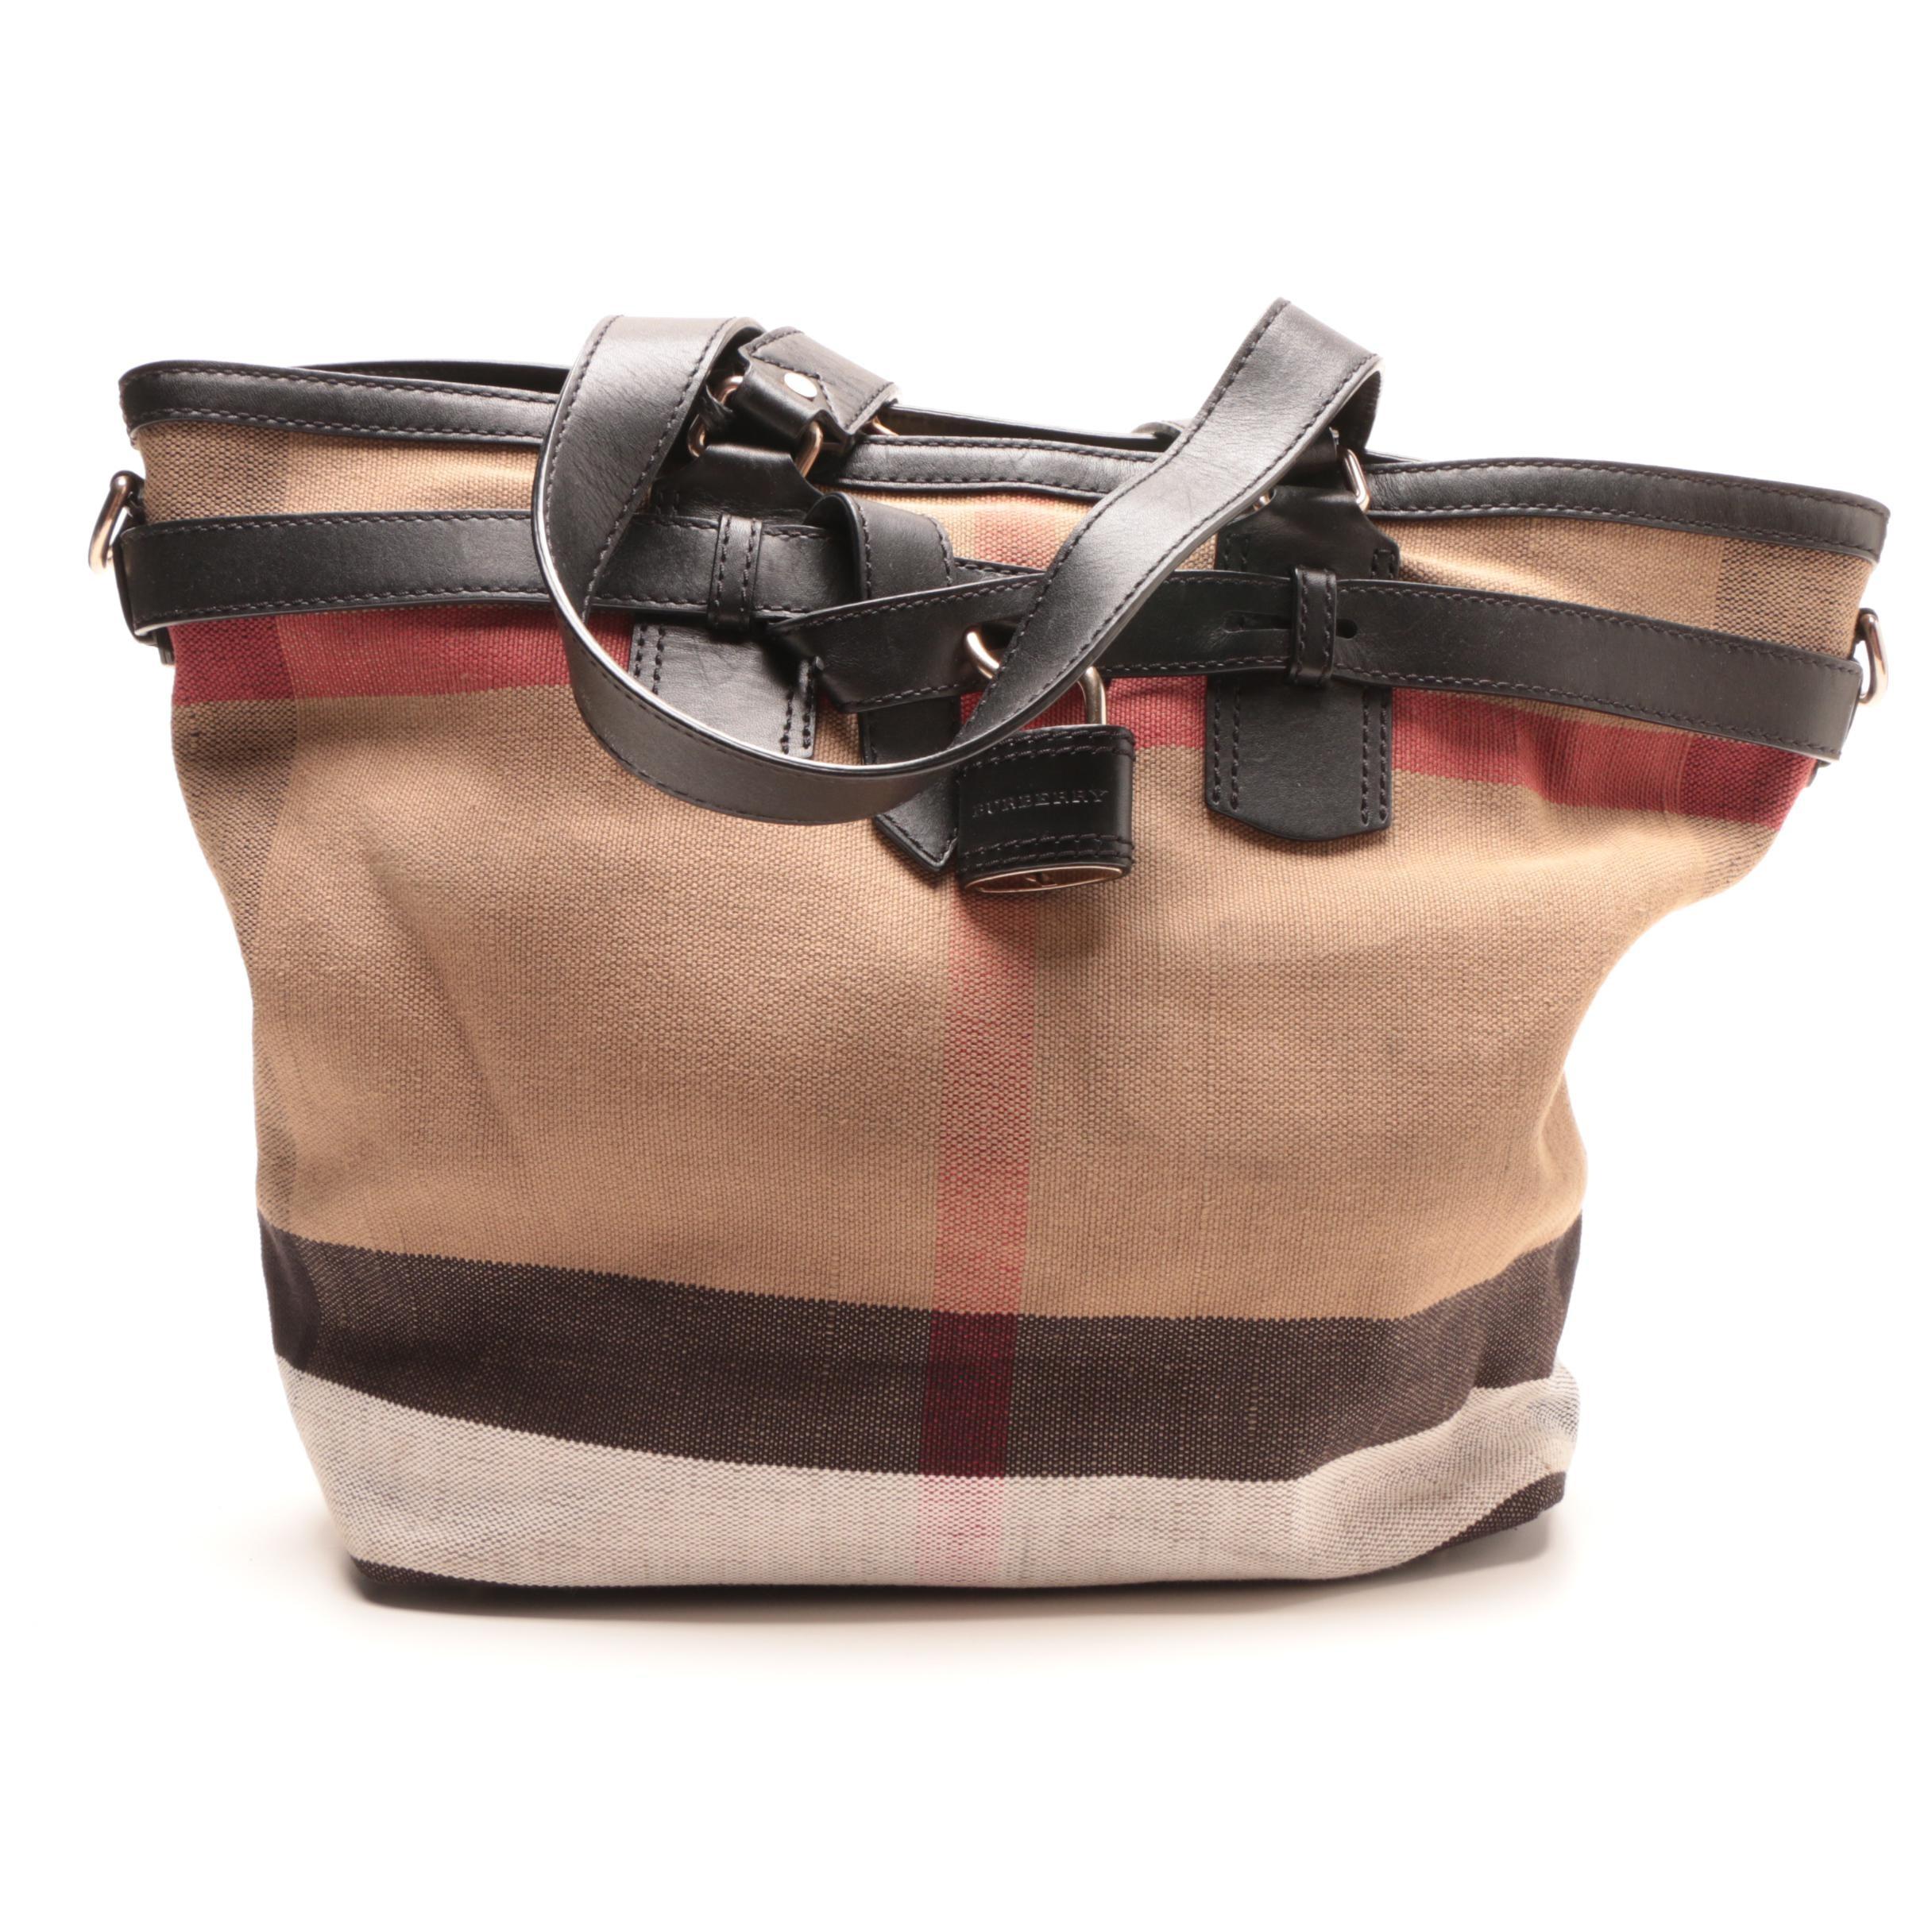 Burberry Check Canvas Padlock Tote Bag